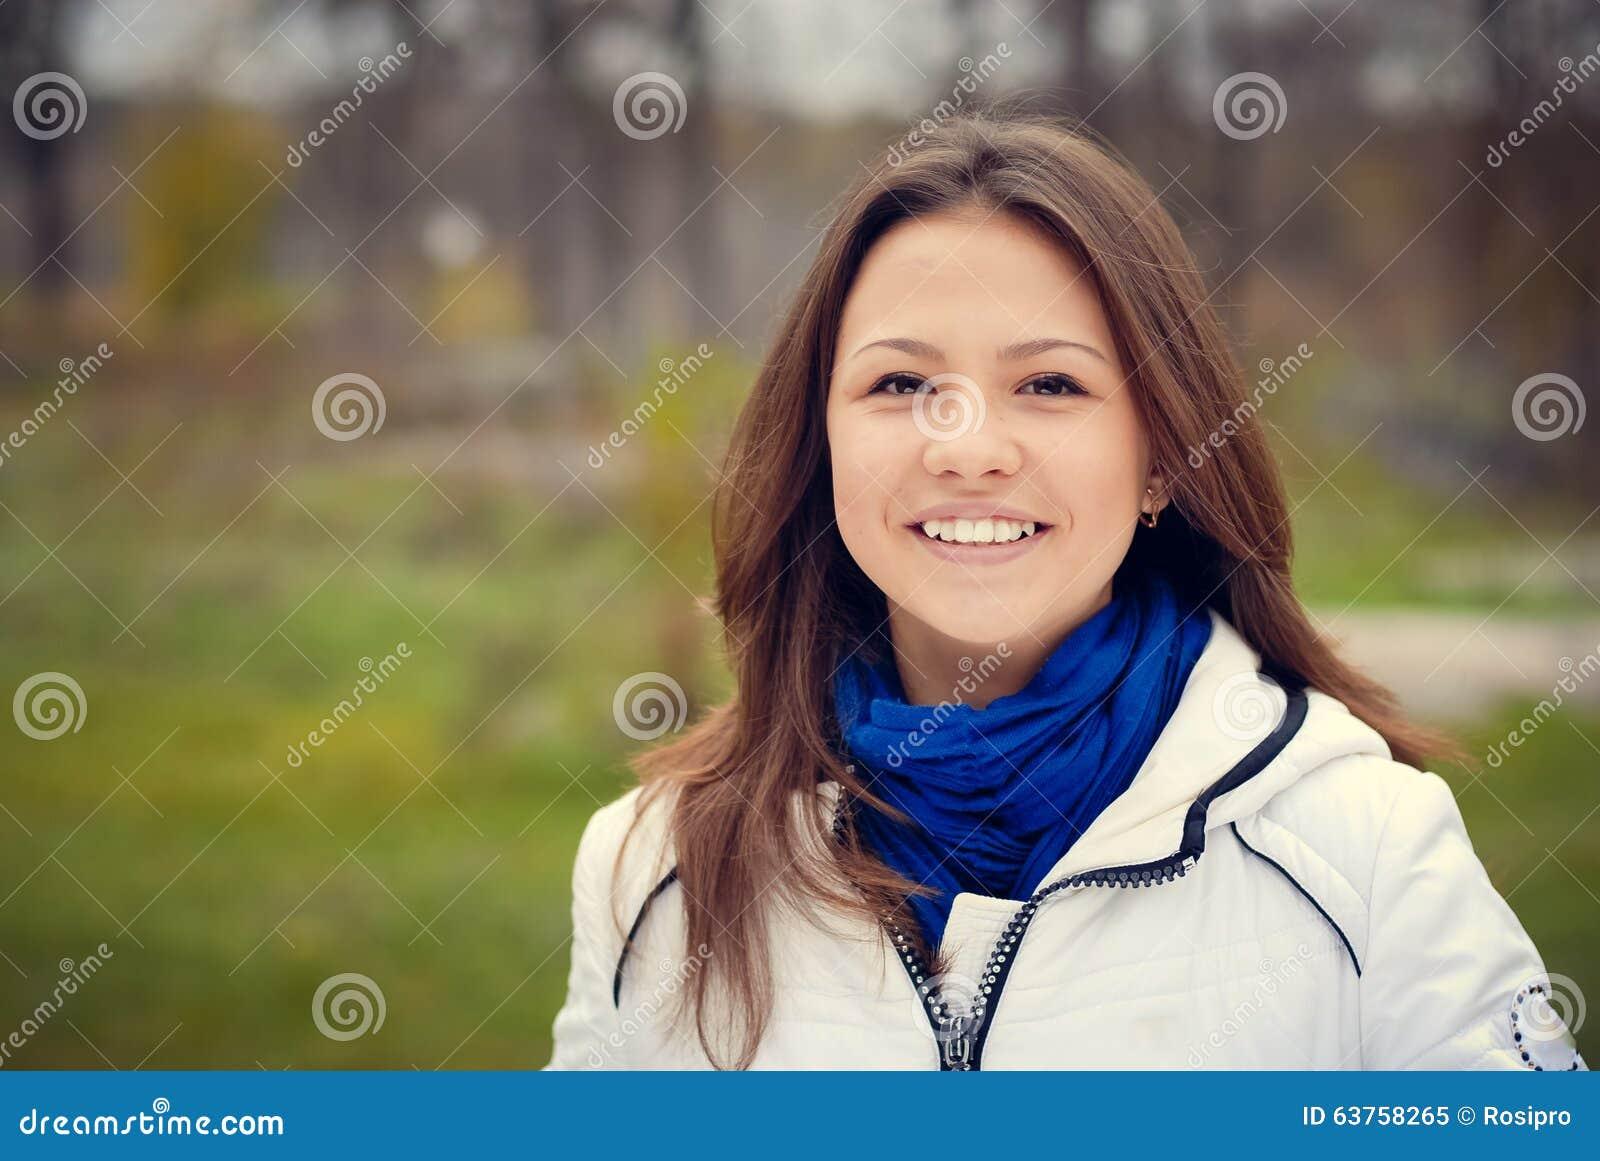 Beautiful brunette girl in white jacket smiling